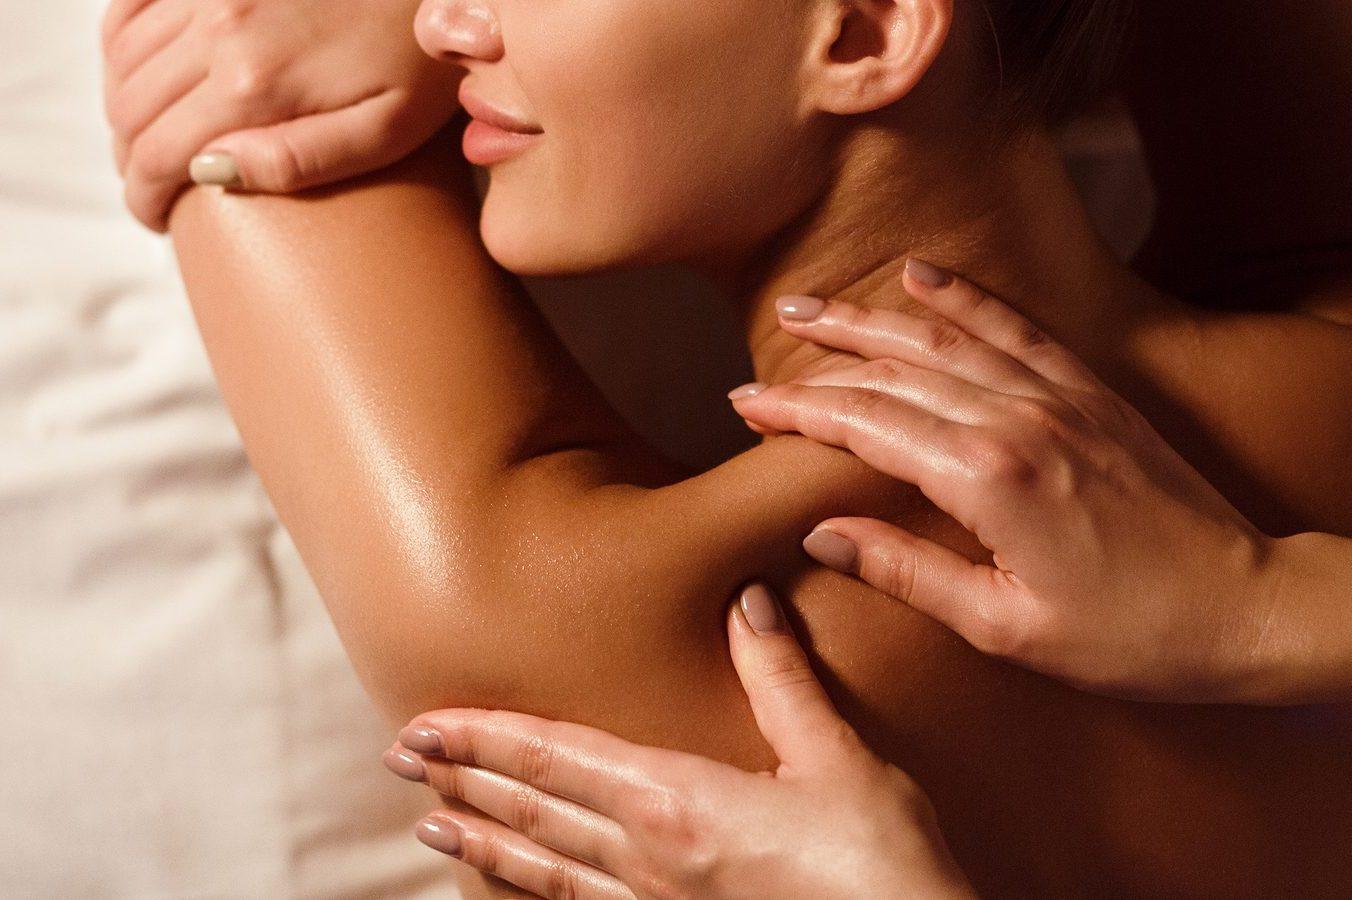 Body Massage. Woman Enjoying Shoulder Massage In Spa Salon, Top